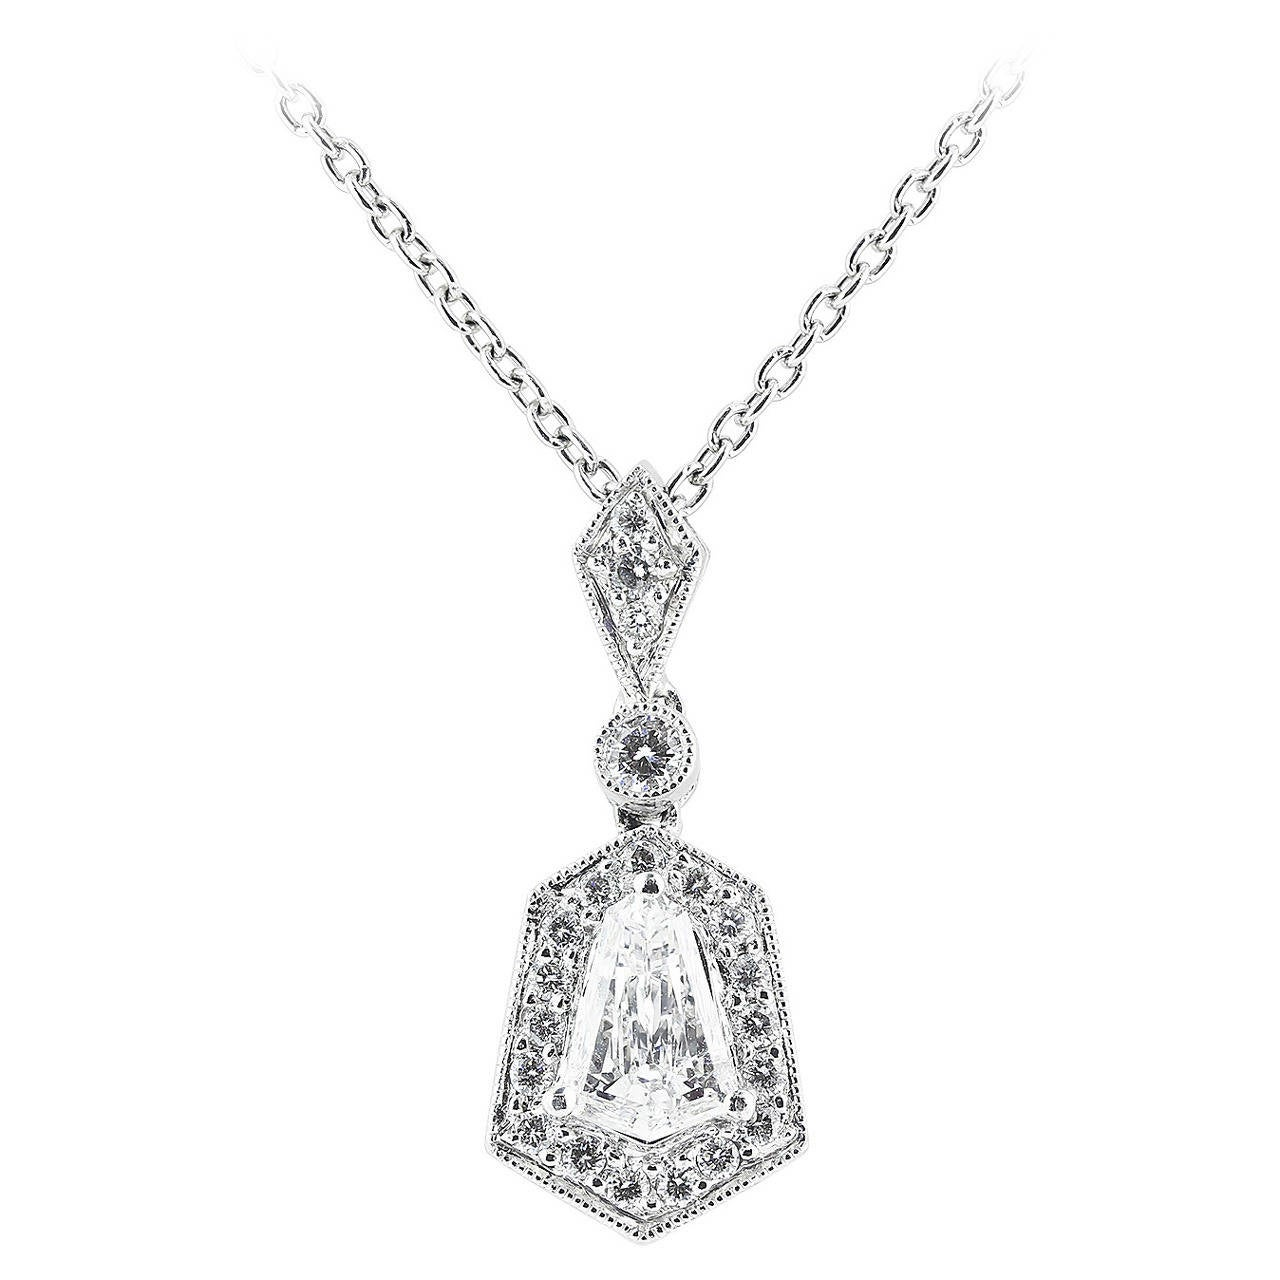 1.20 Carat Diamond Platinum Pendant For Sale